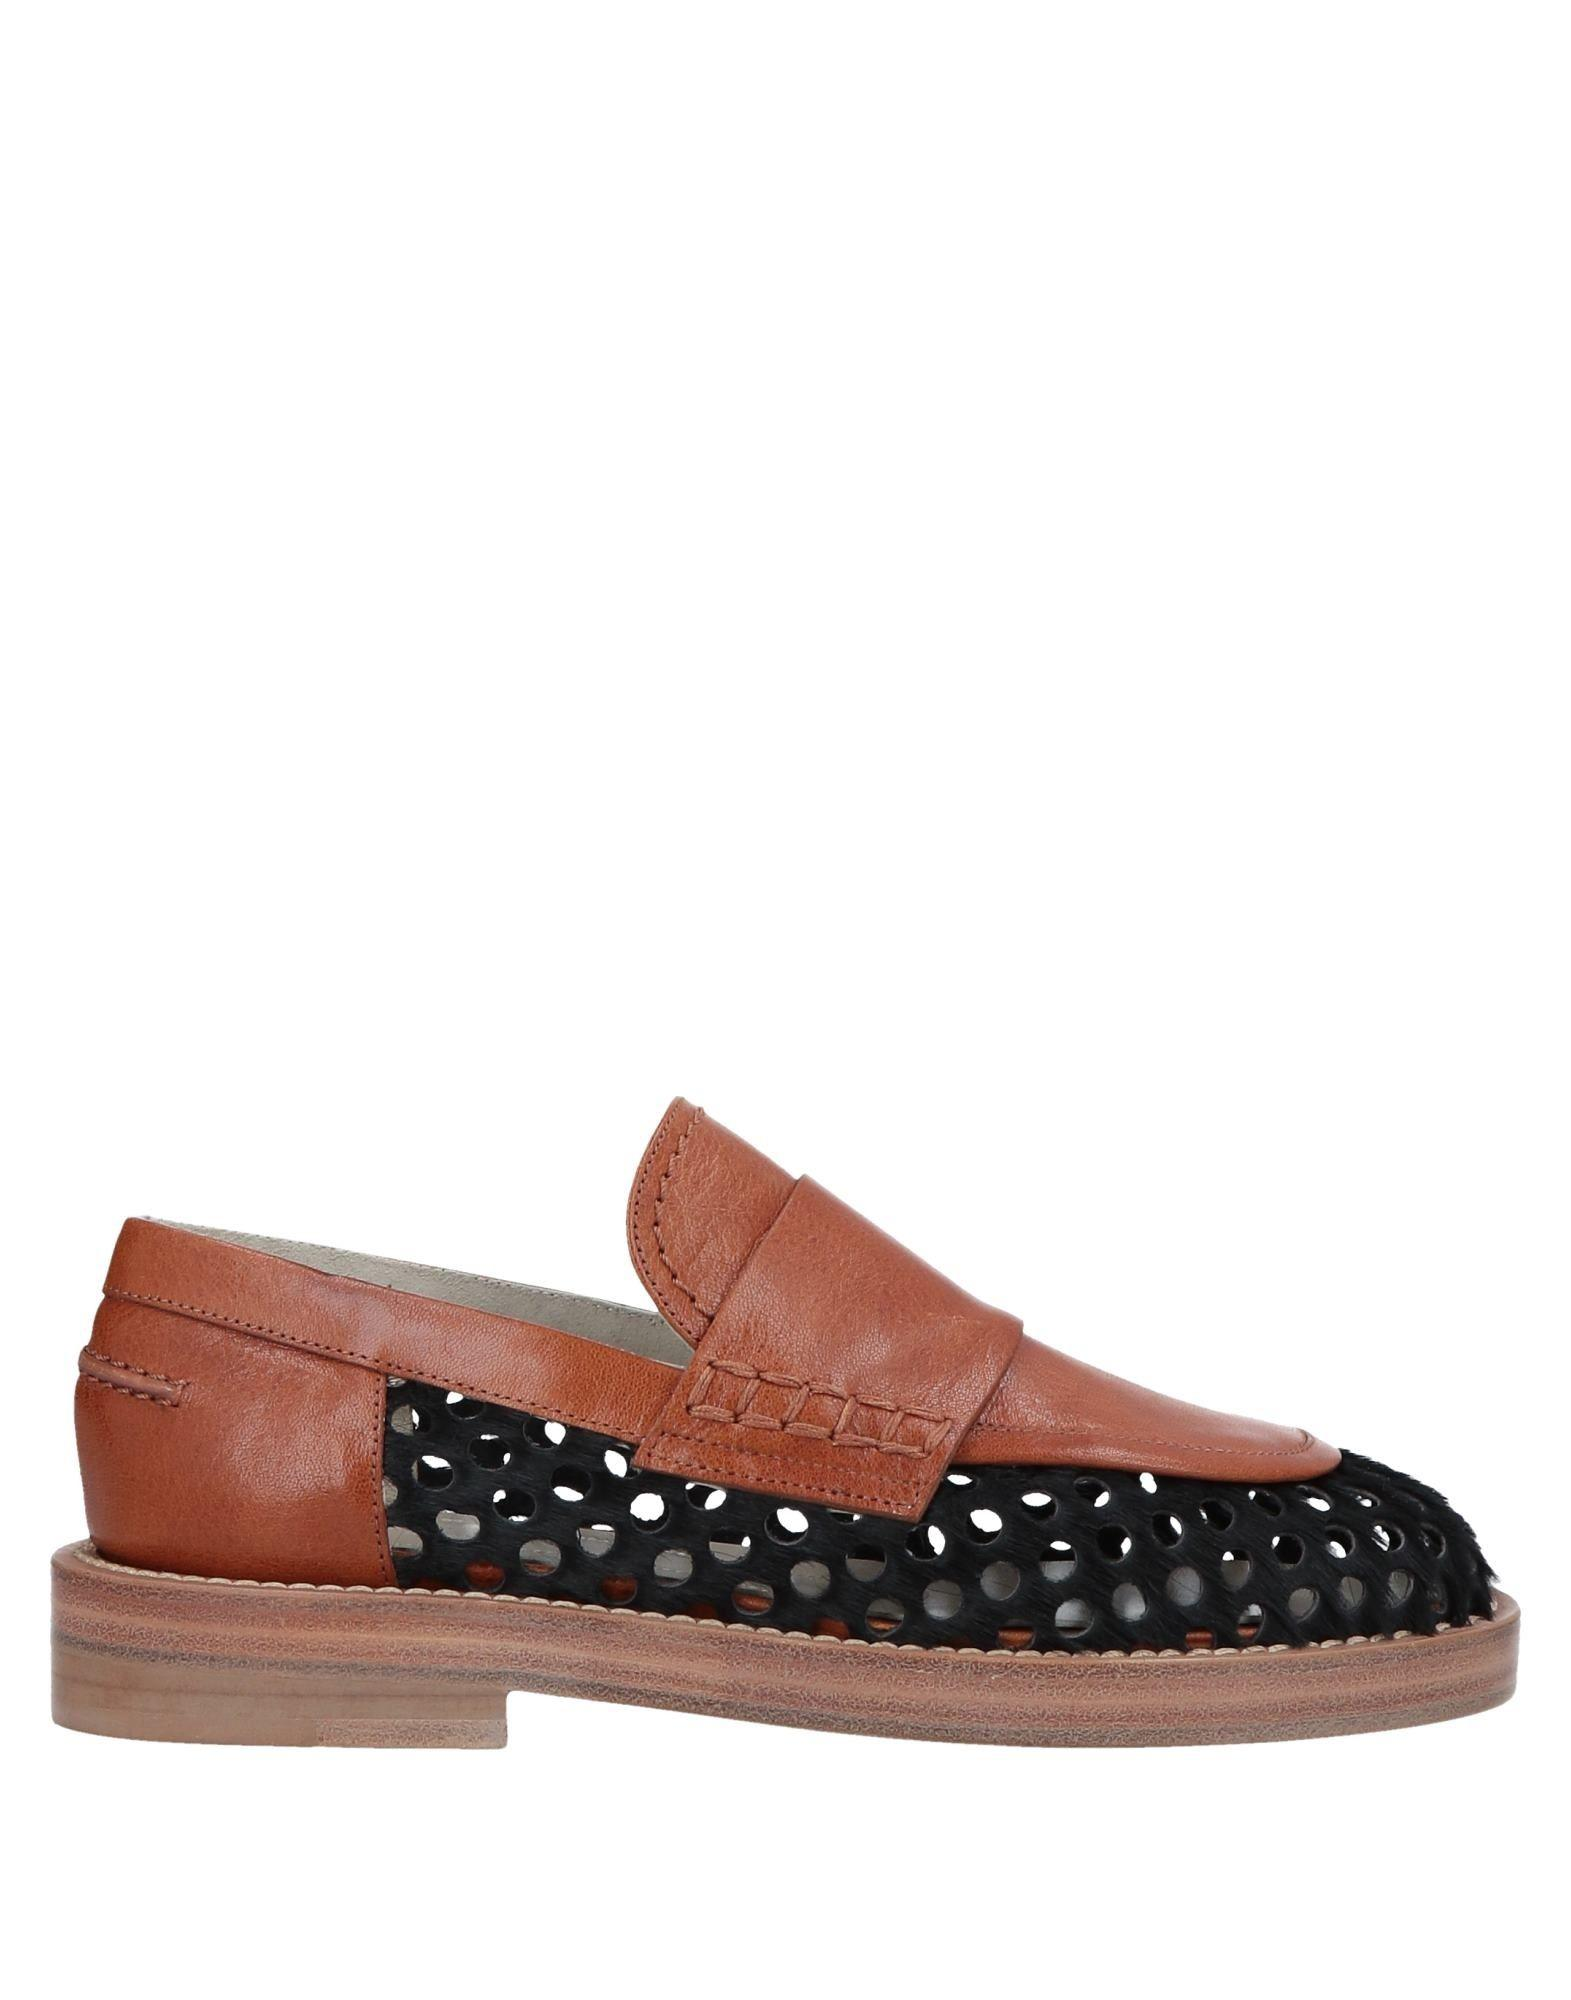 c720221028e Marni Loafer in Black - Lyst